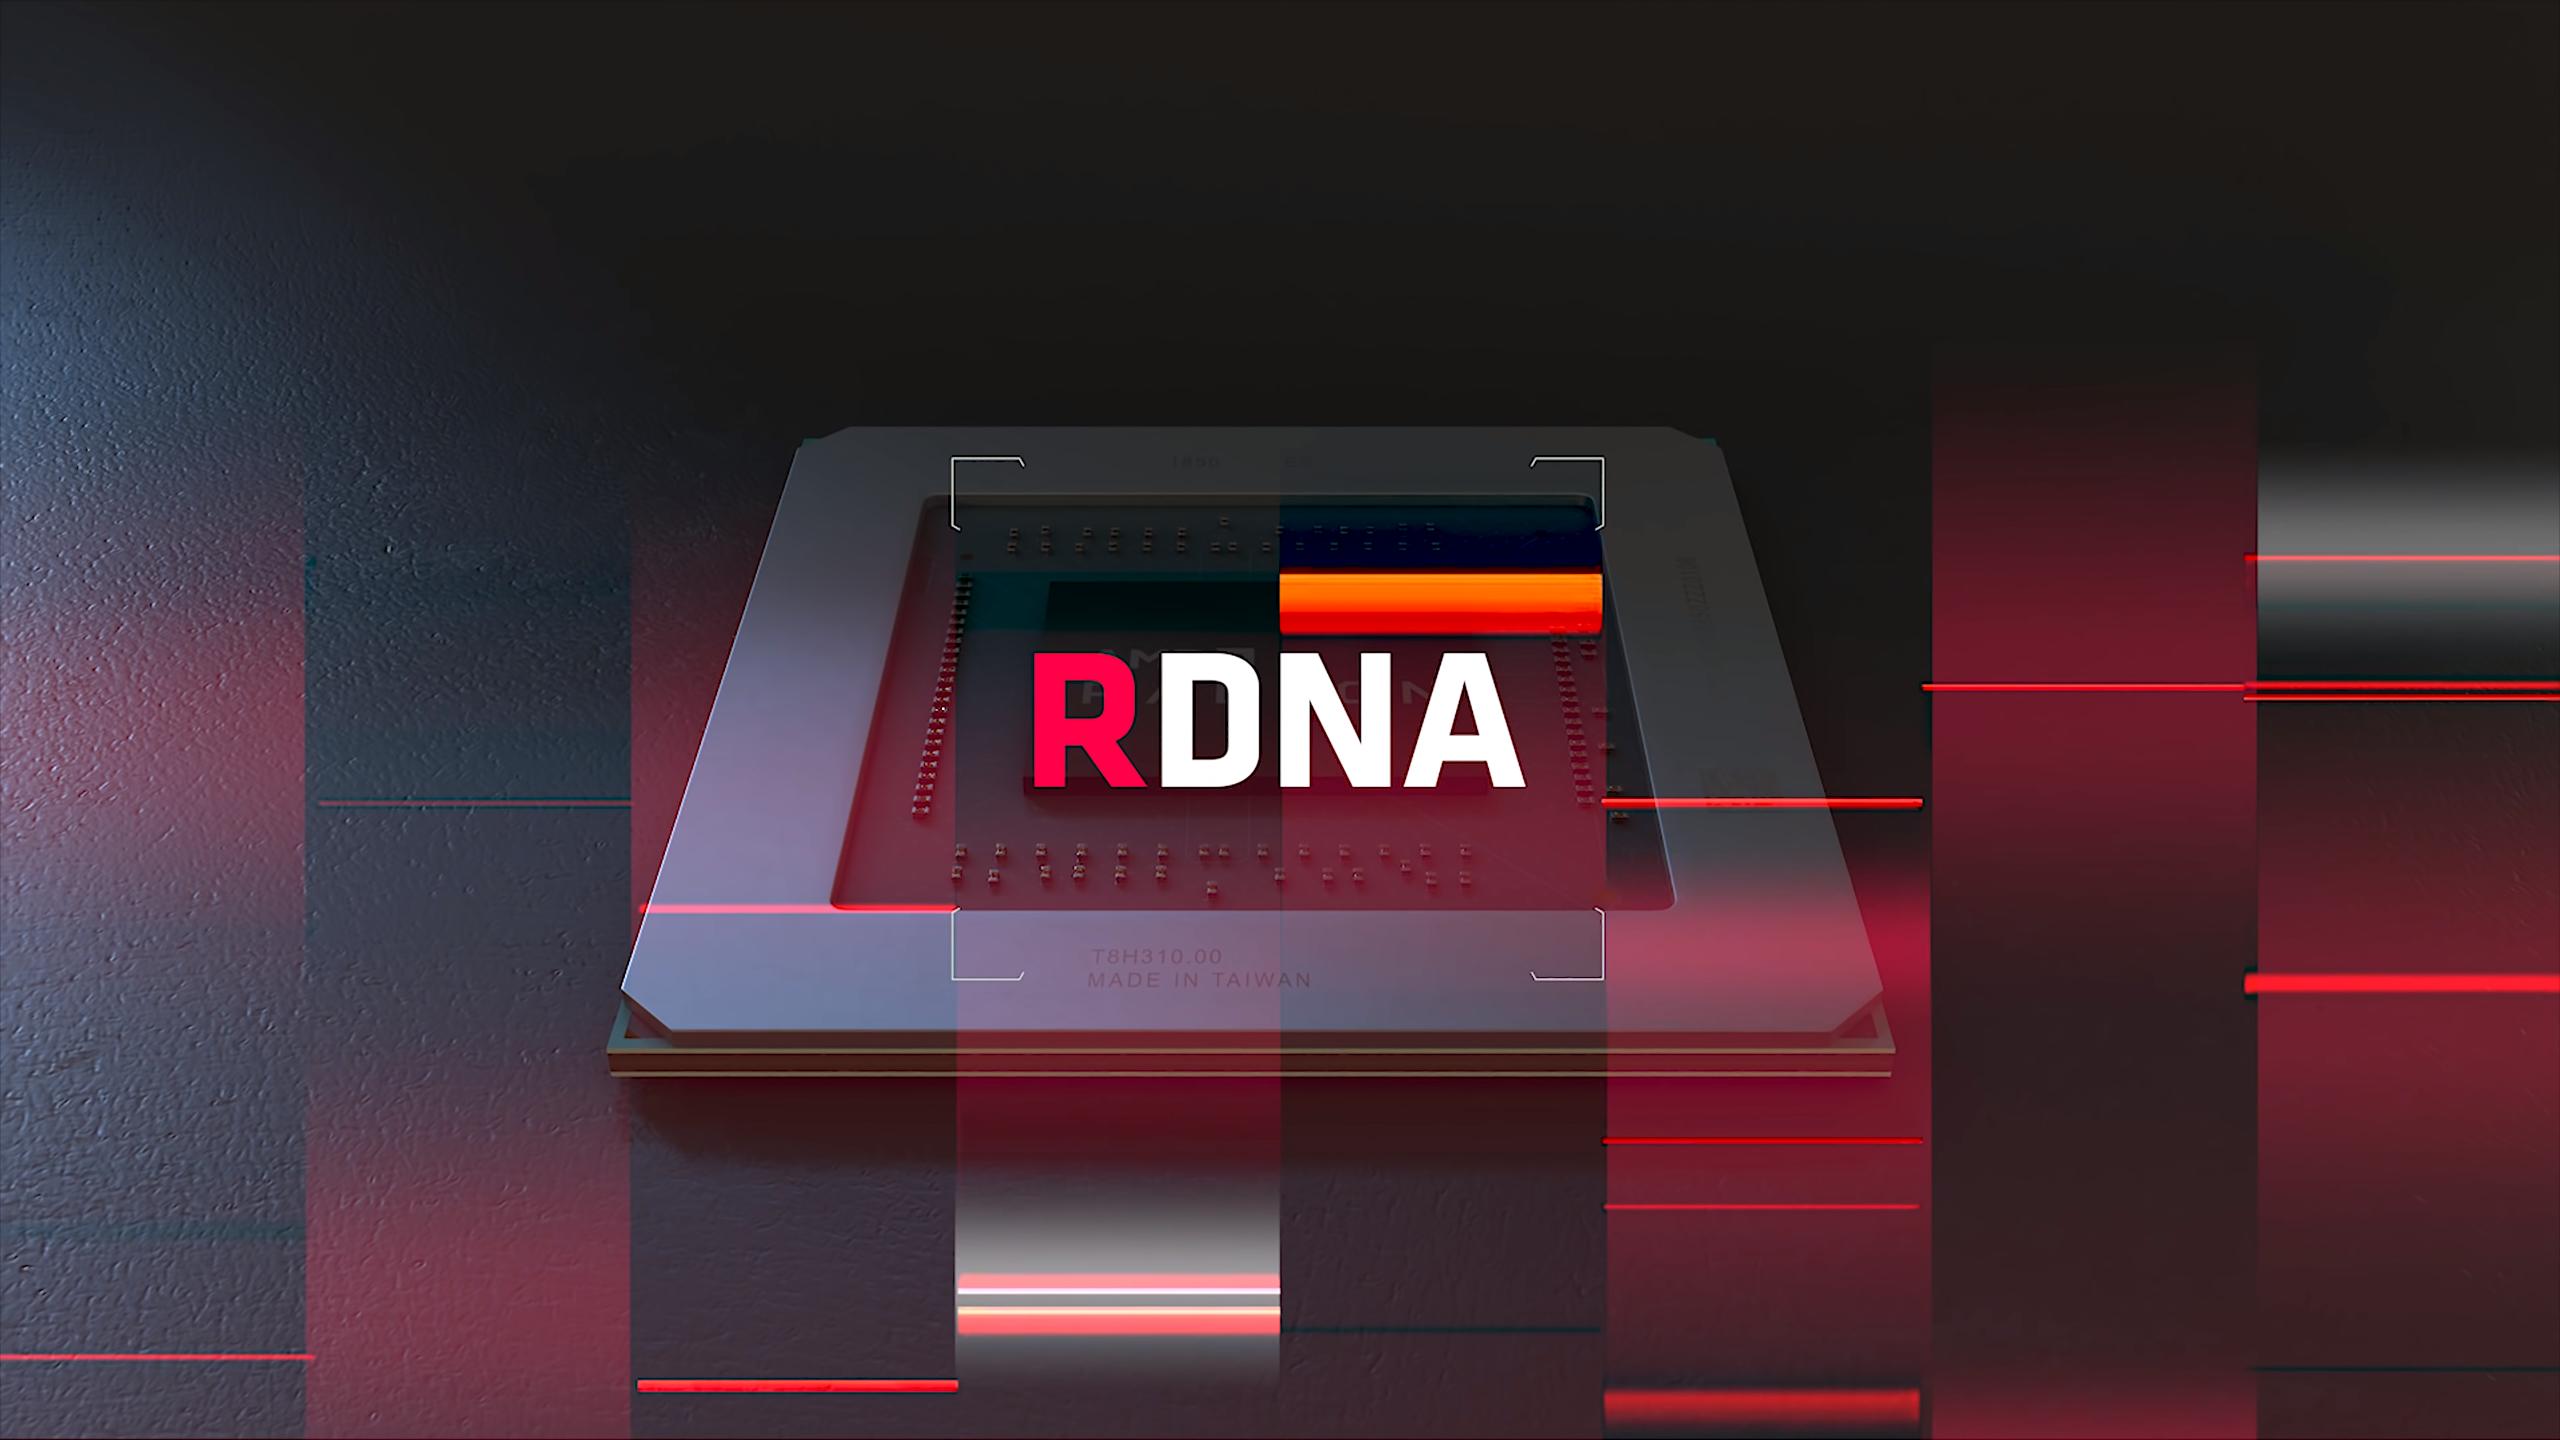 Amd Navi 23 Navi 21 High End Radeon Rx Gpus Rumored For 2020